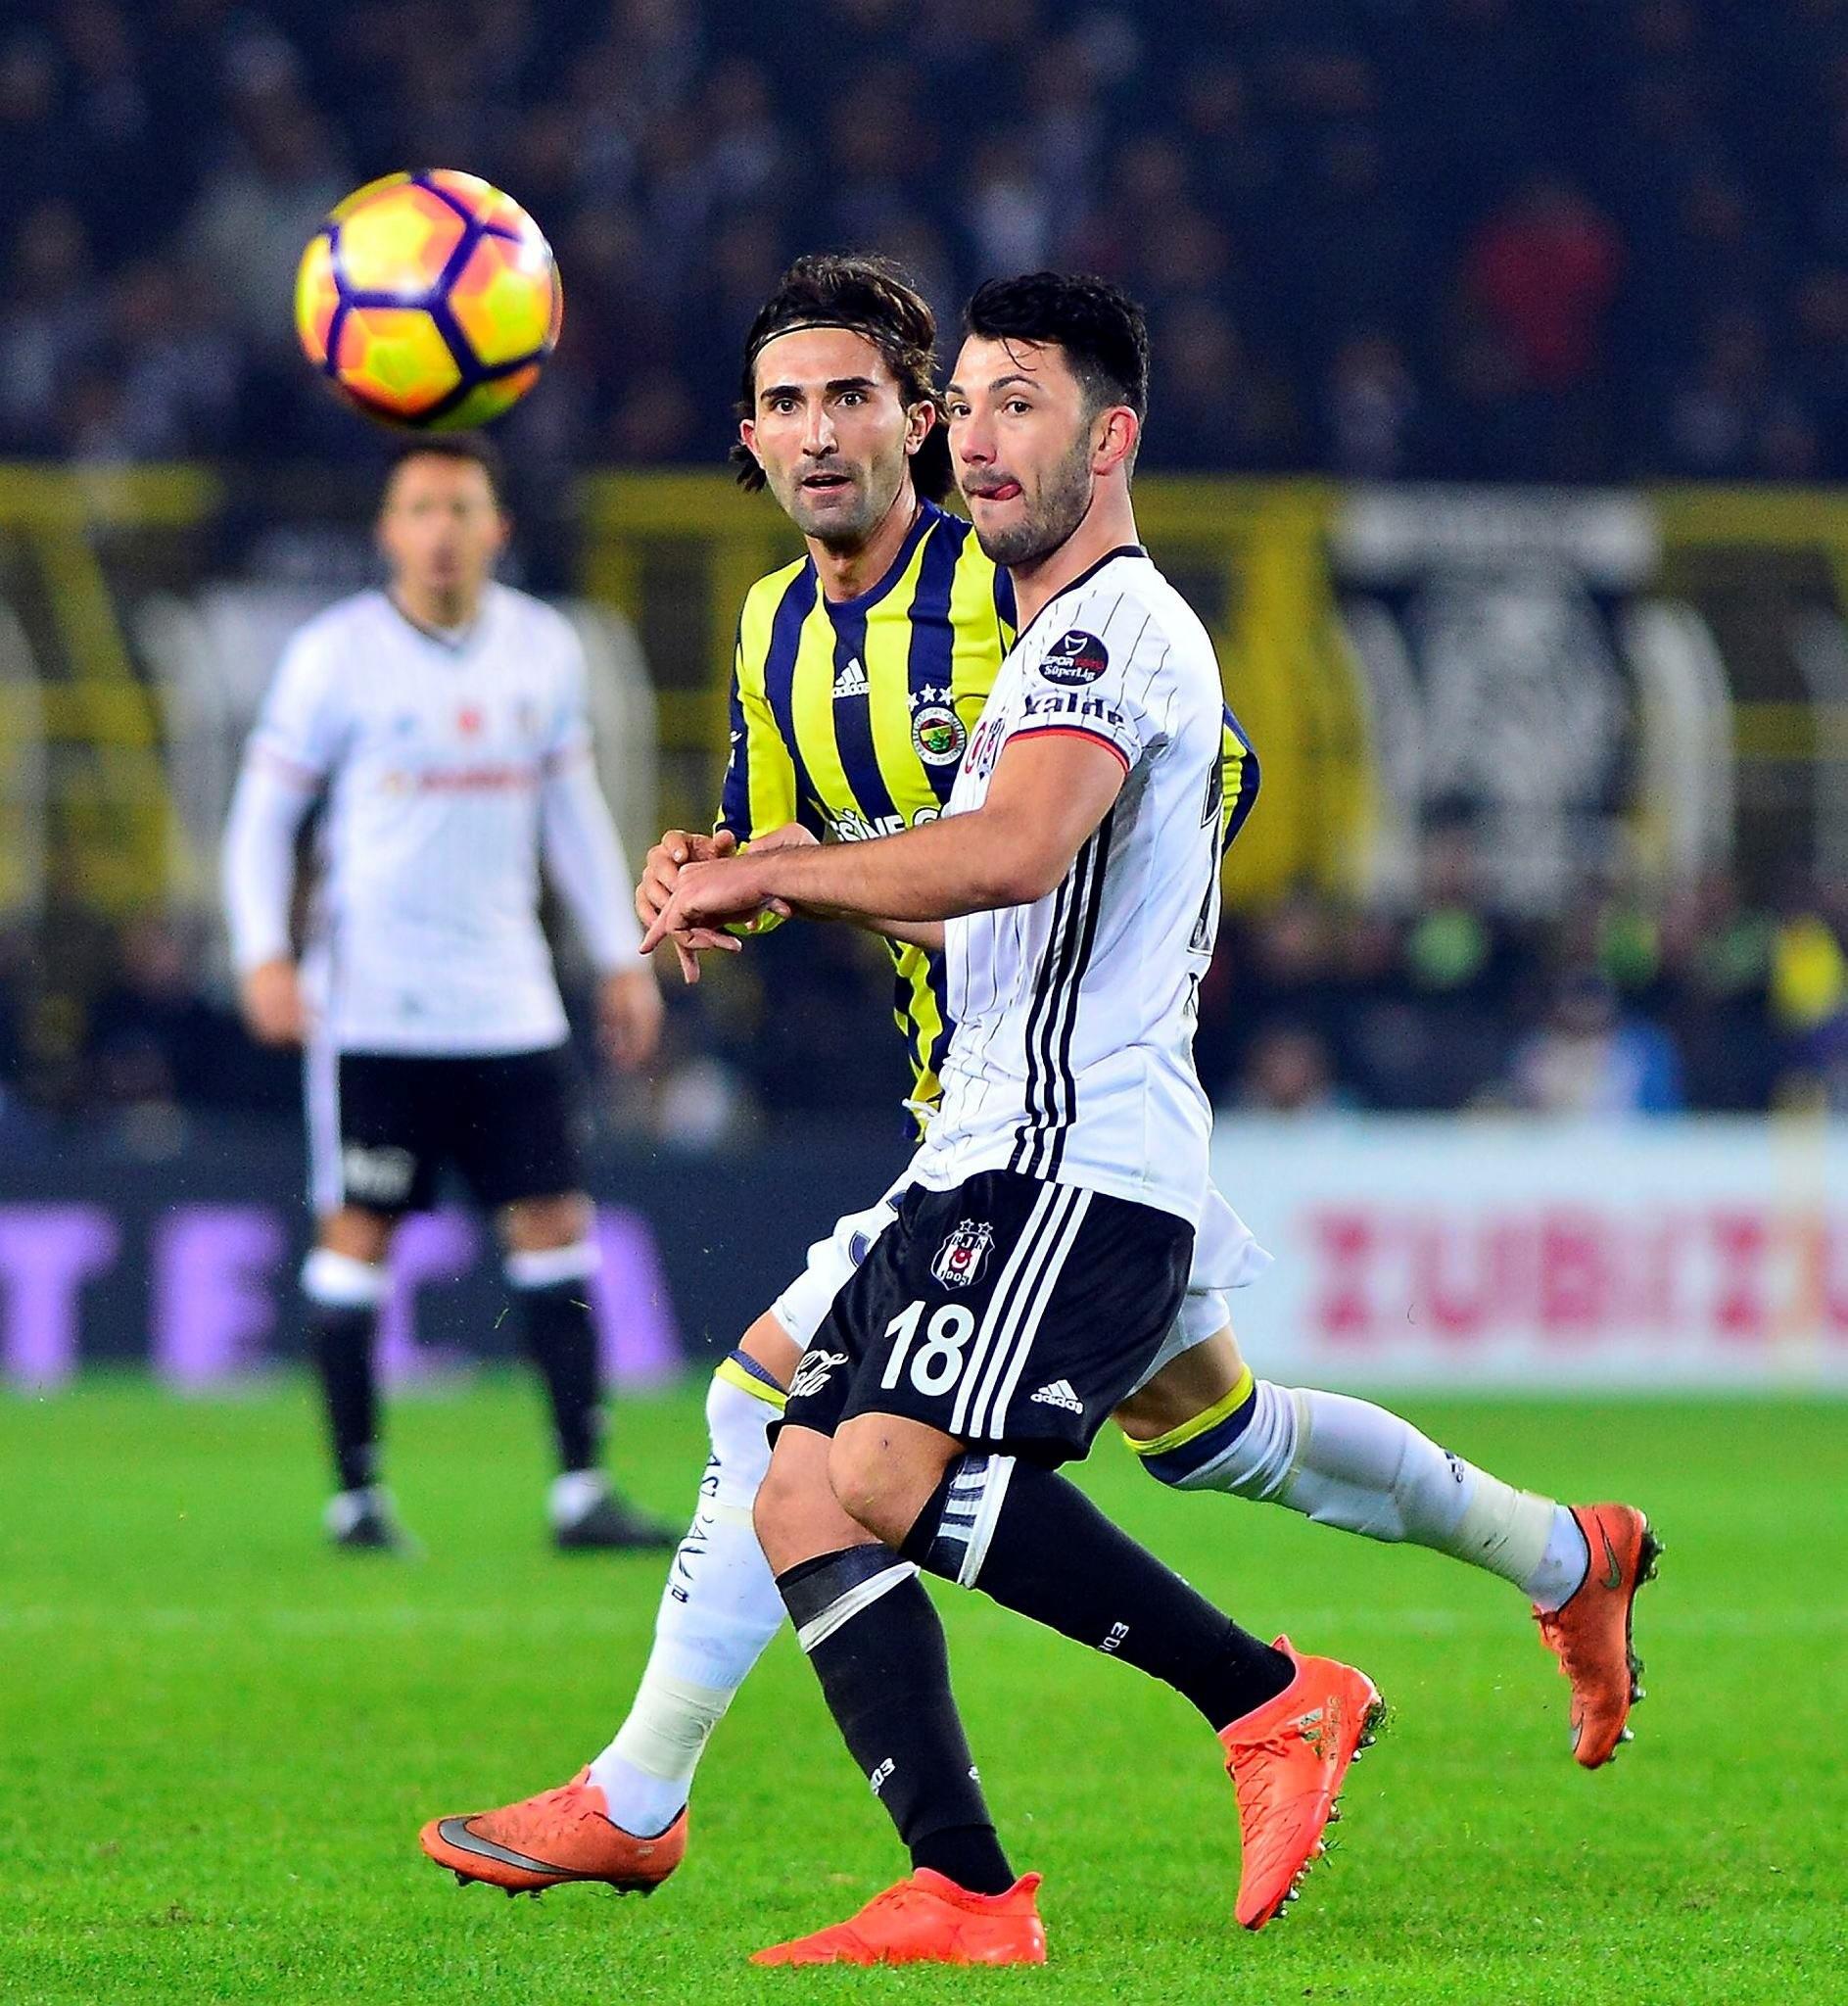 The last match between the two Istanbul powerhouses ended in a 0-0 draw on Dec. 4, 2016, in the u00dclker Stadium u015eu00fckru00fc Sarau00e7ou011flu Sport Complex.